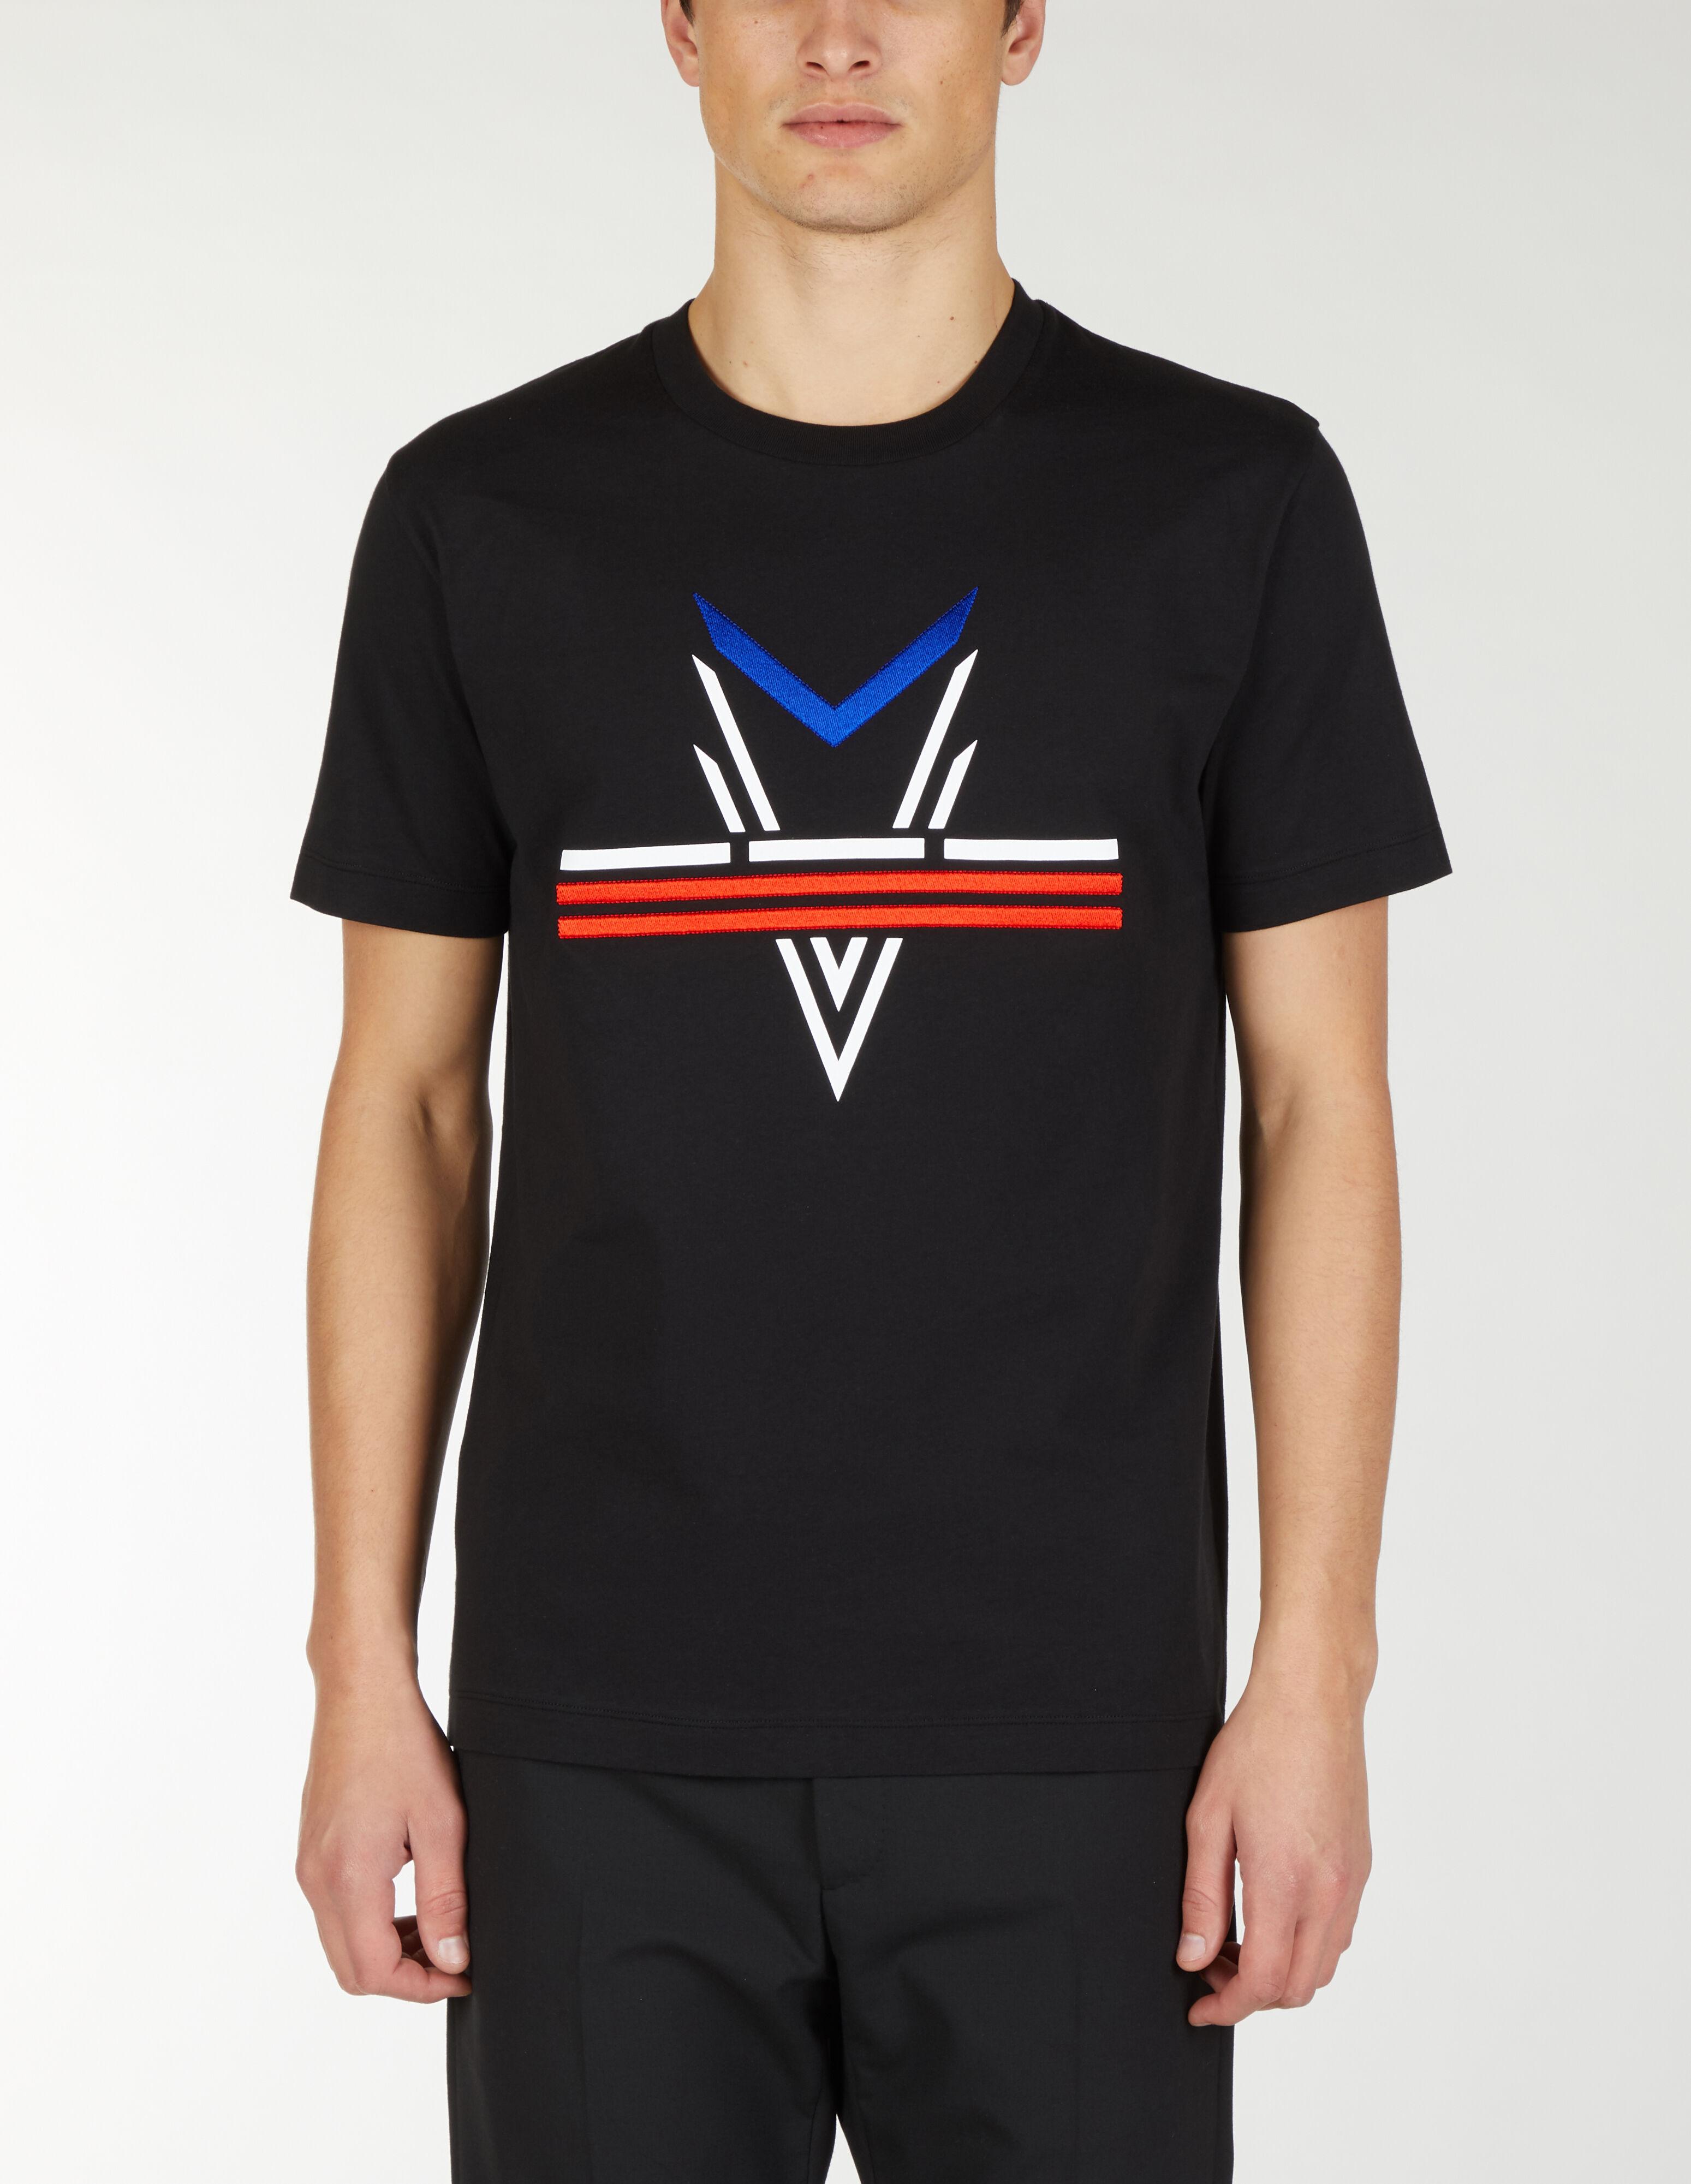 T-Shirt Dardi Con Occhielli - Les Hommes